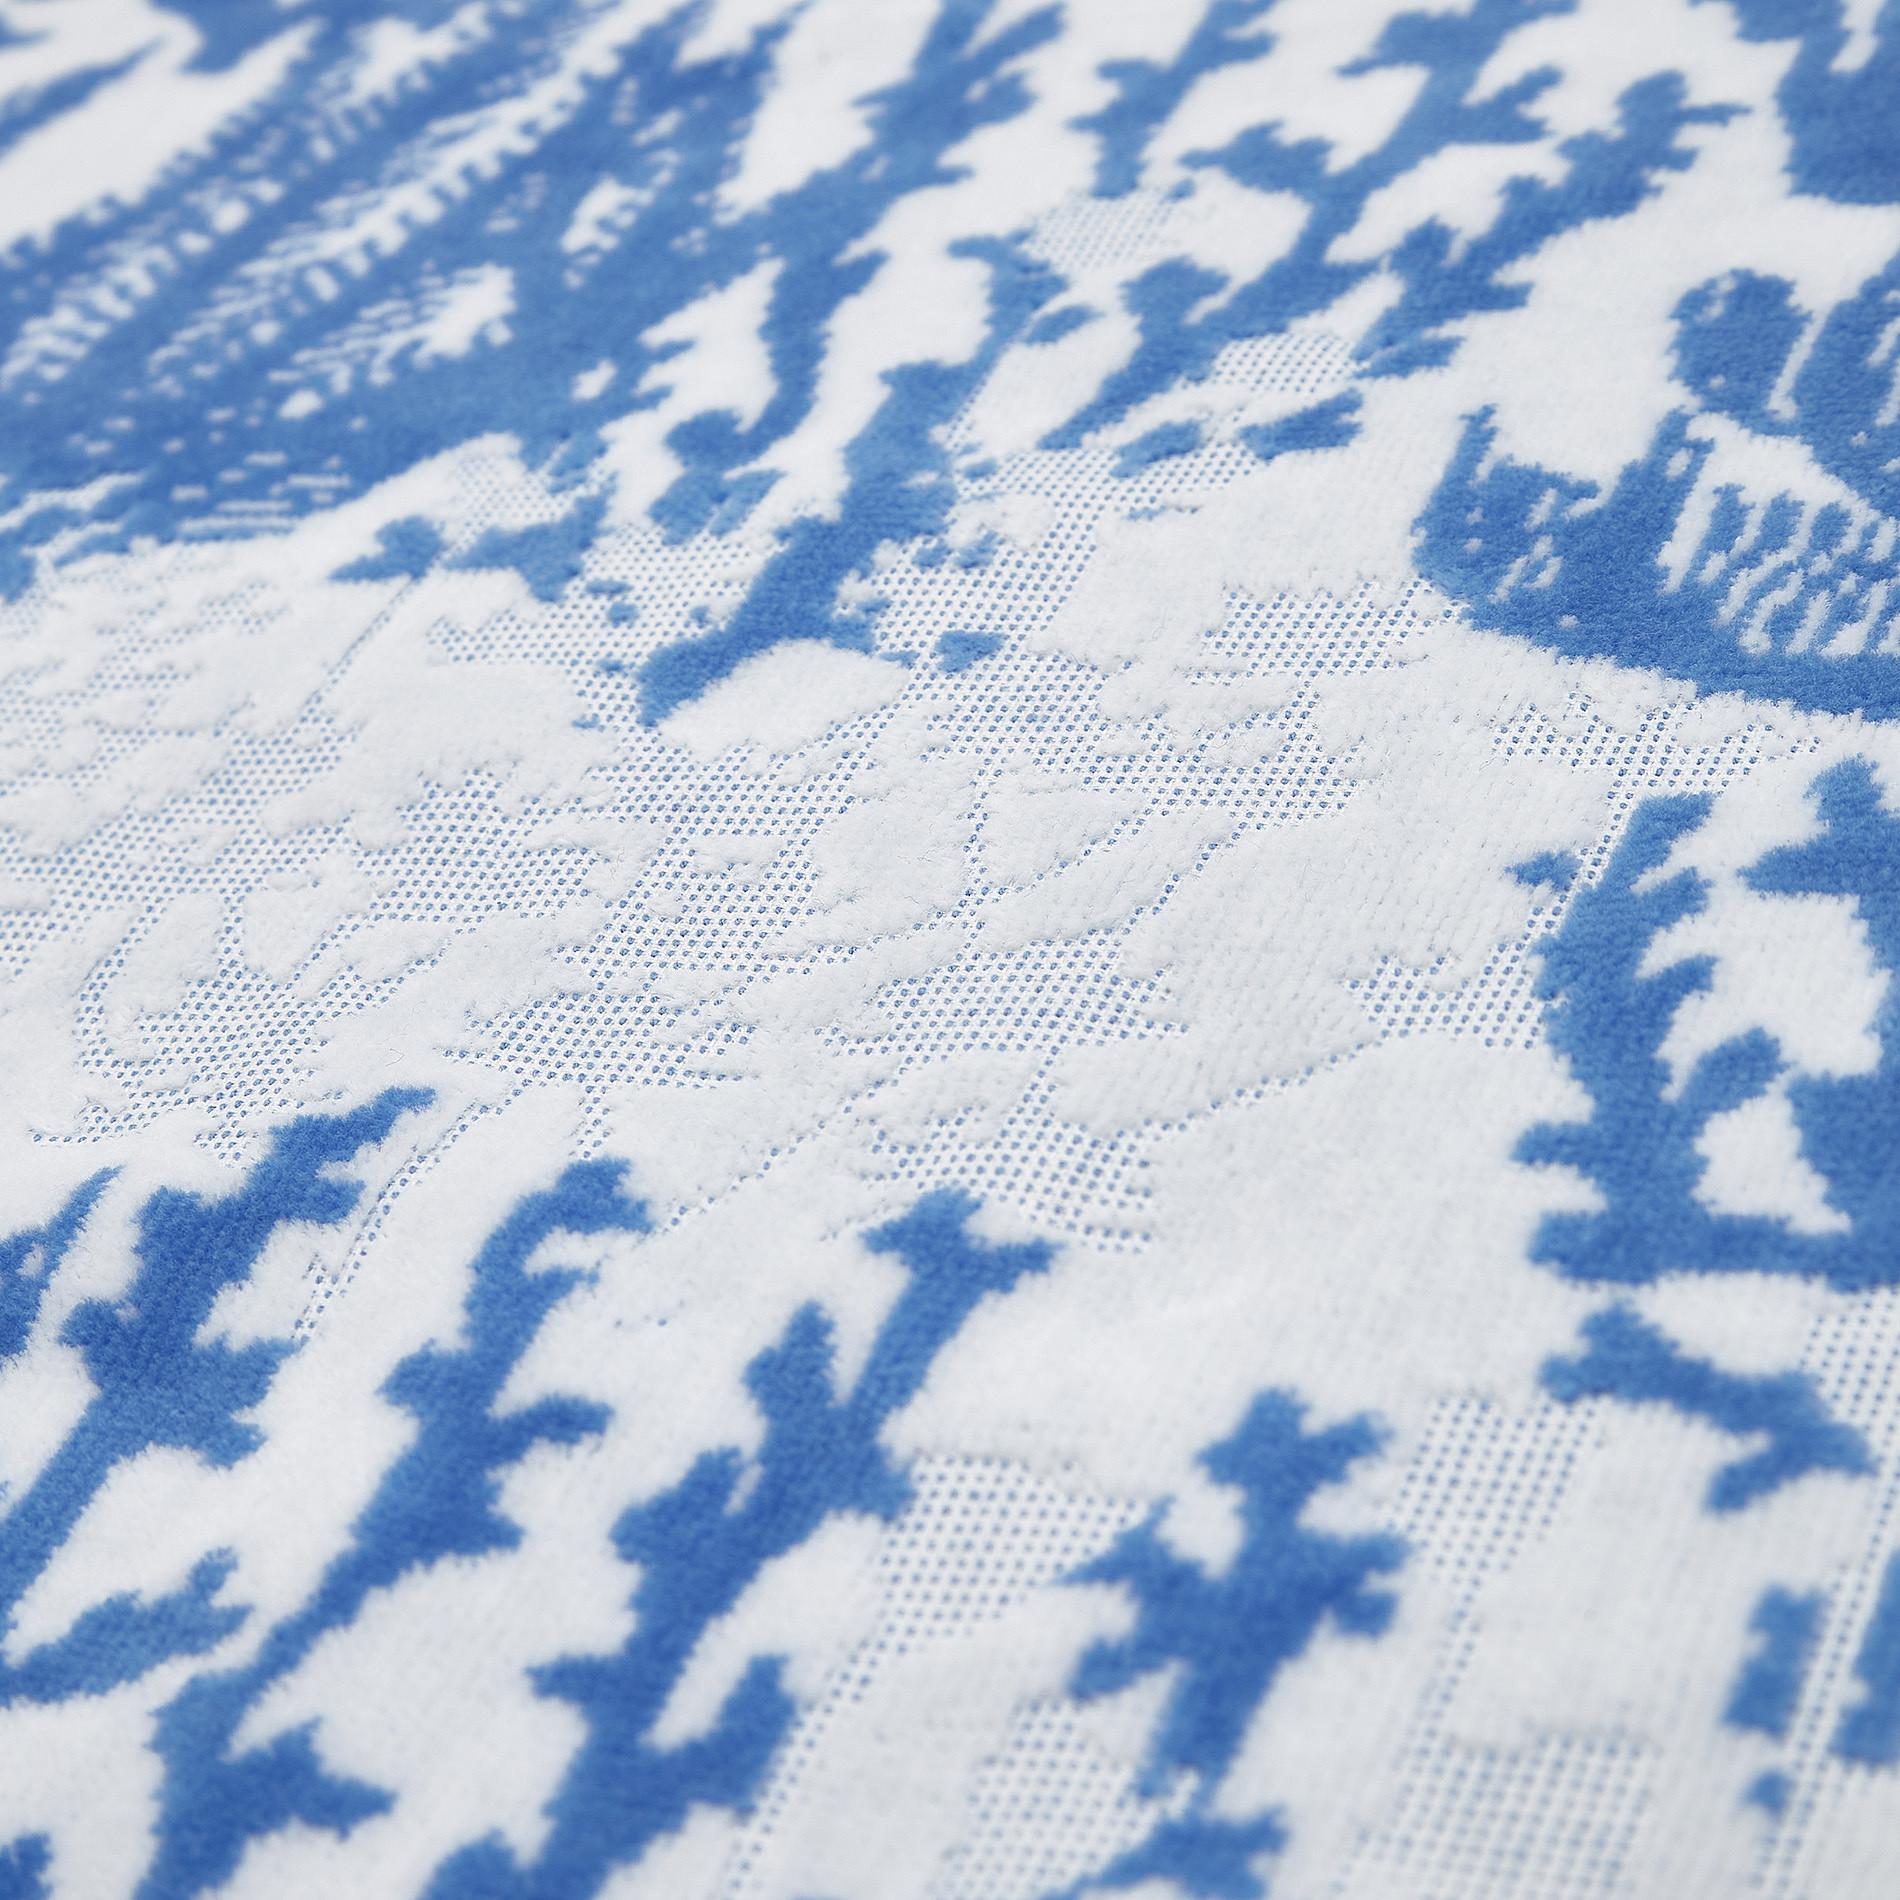 Asciugamano cotone velour motivo coralli, Blu, large image number 2